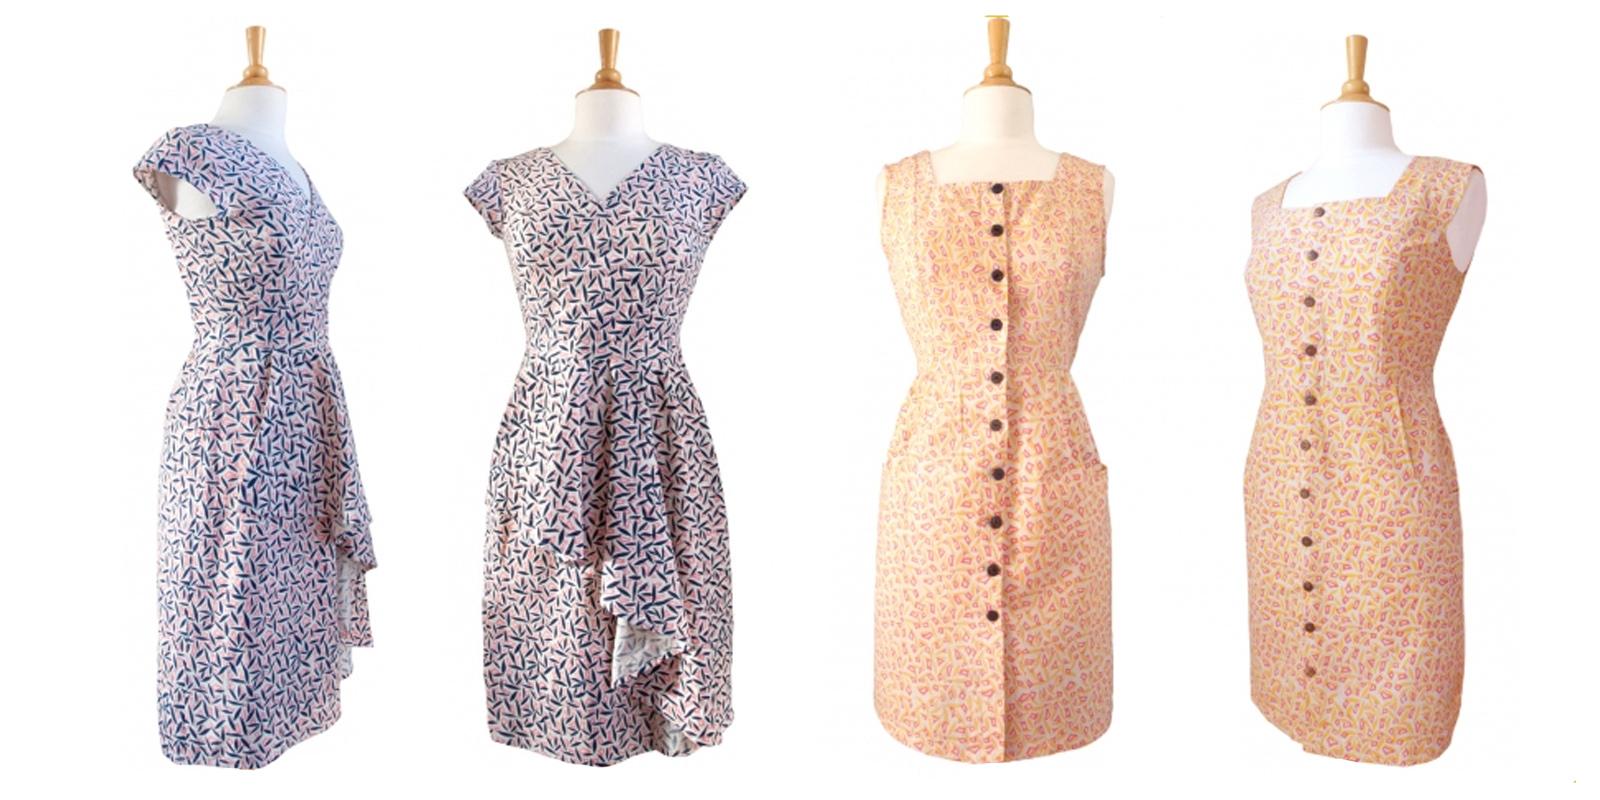 Jin Ju Ruffle Dress pink/blue and Pagoda Pocket Dress yellow. Textile design by Shifra Whiteman.